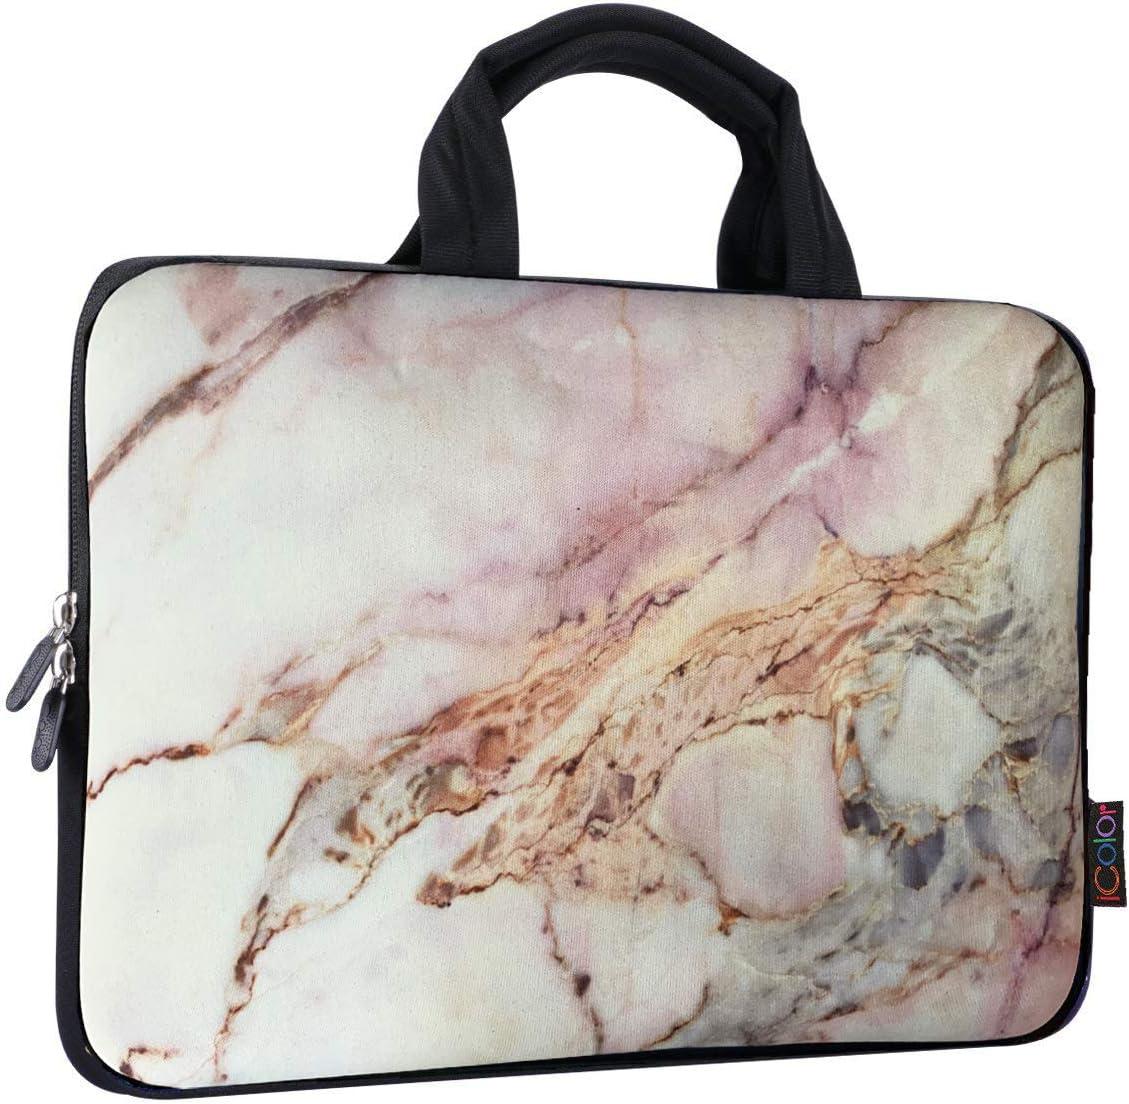 ICOLOR 11 11.6 12 12.1 12.5 inch Laptop Carrying Bag Chromebook Case Notebook Ultrabook Bag Tablet Cover Neoprene Laptop Sleeve case chromebook Sleeve with Handle Kids Boys Girls Marble